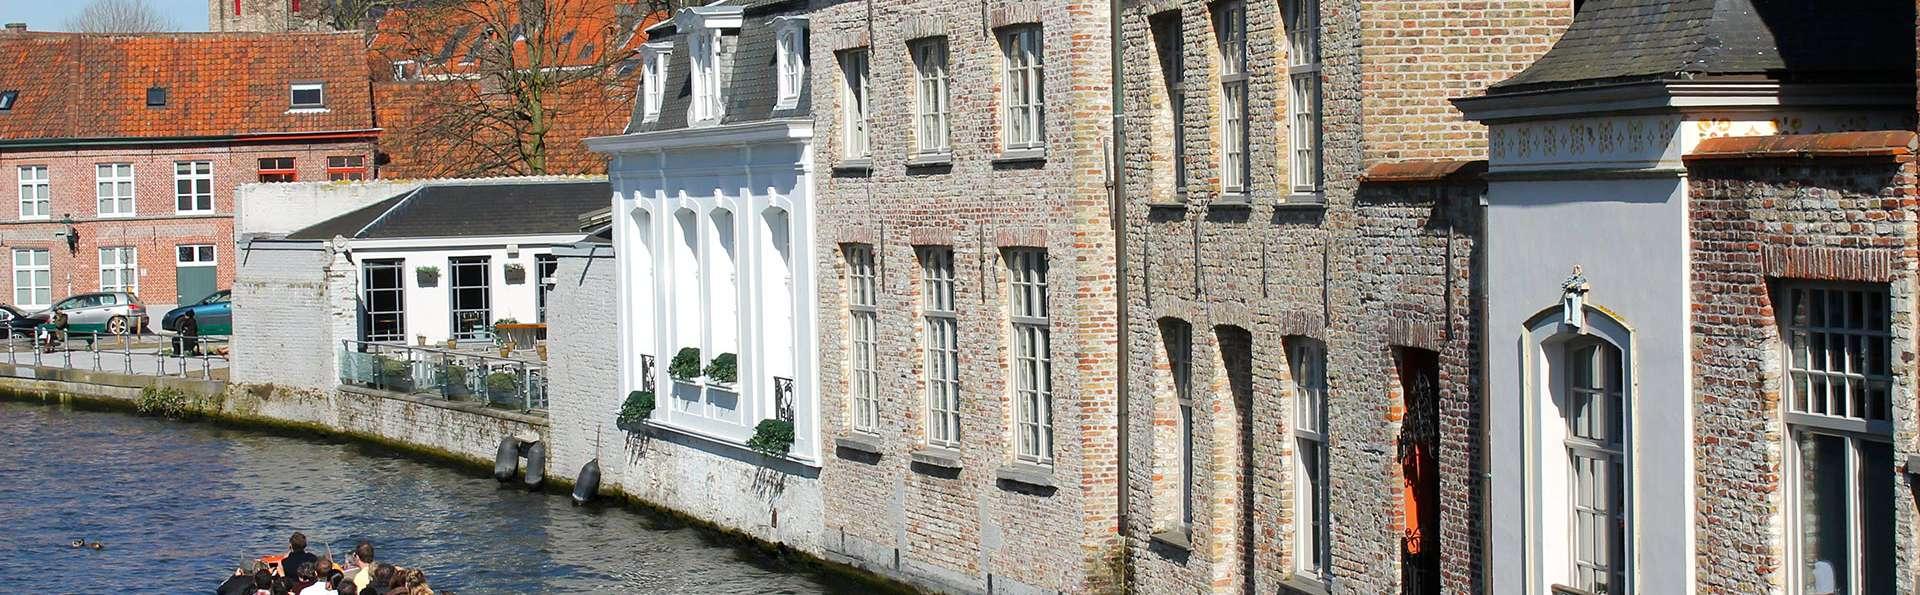 Canalview hotel Ter Reien - EDIT_destination1.jpg